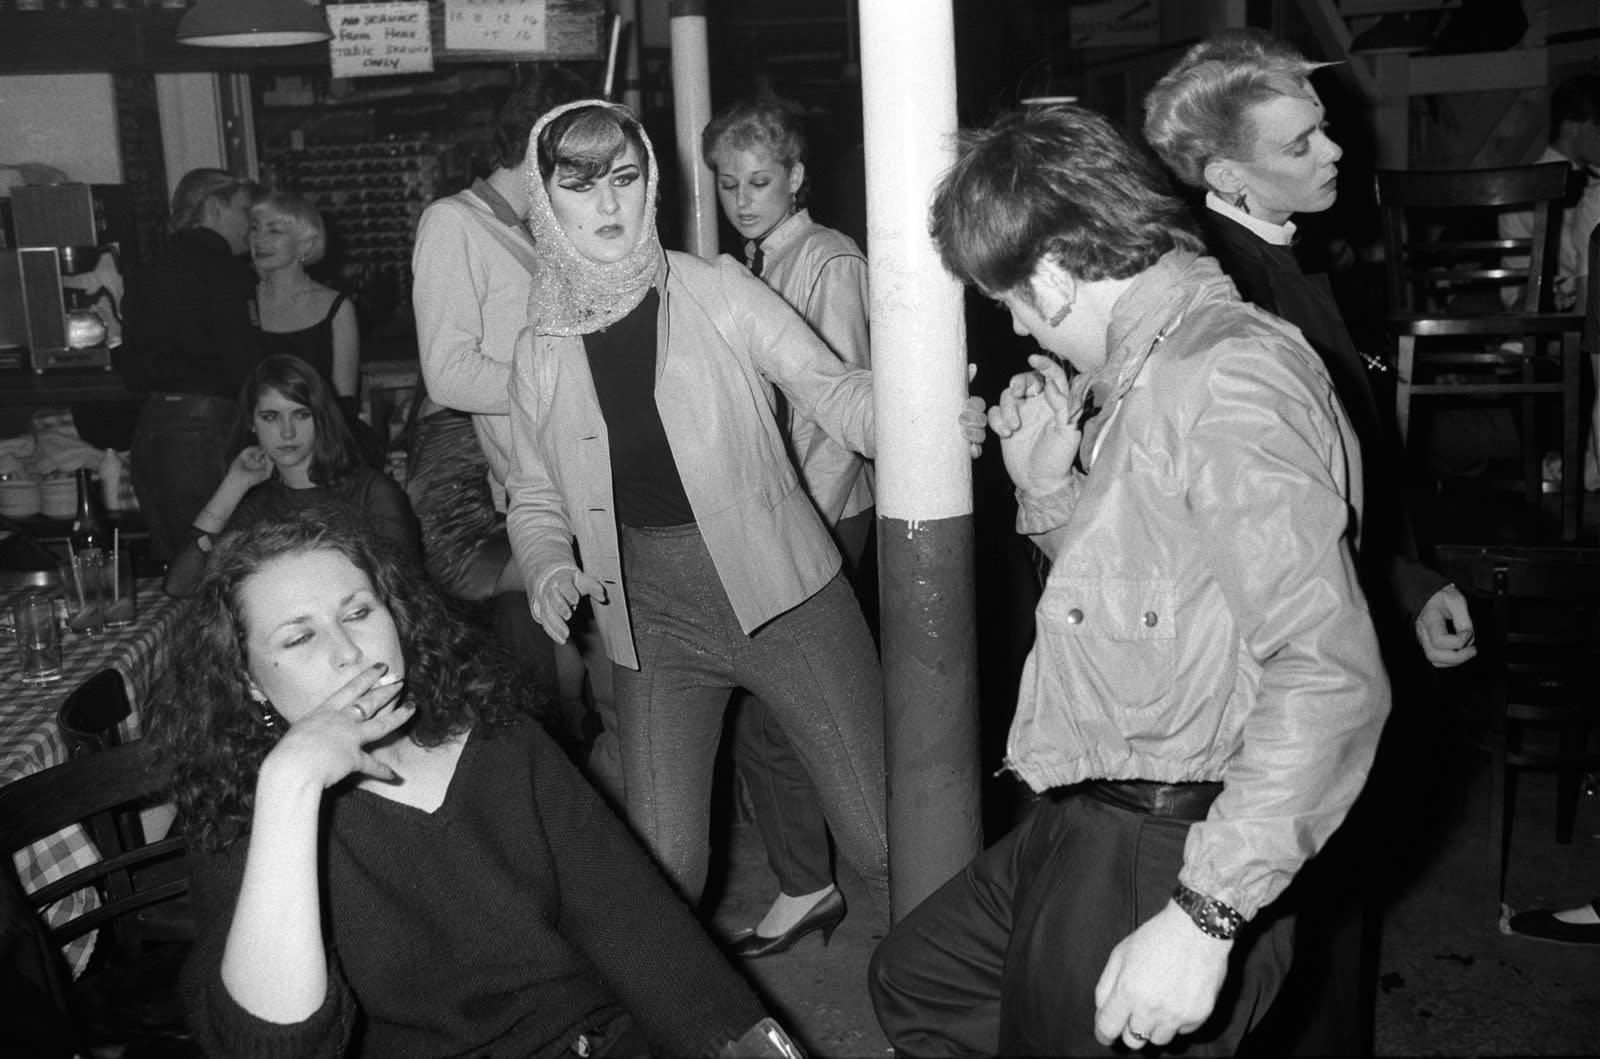 Homer Sykes, Blitz Kids at The Blitz Club, Covent Garden, London, 1980